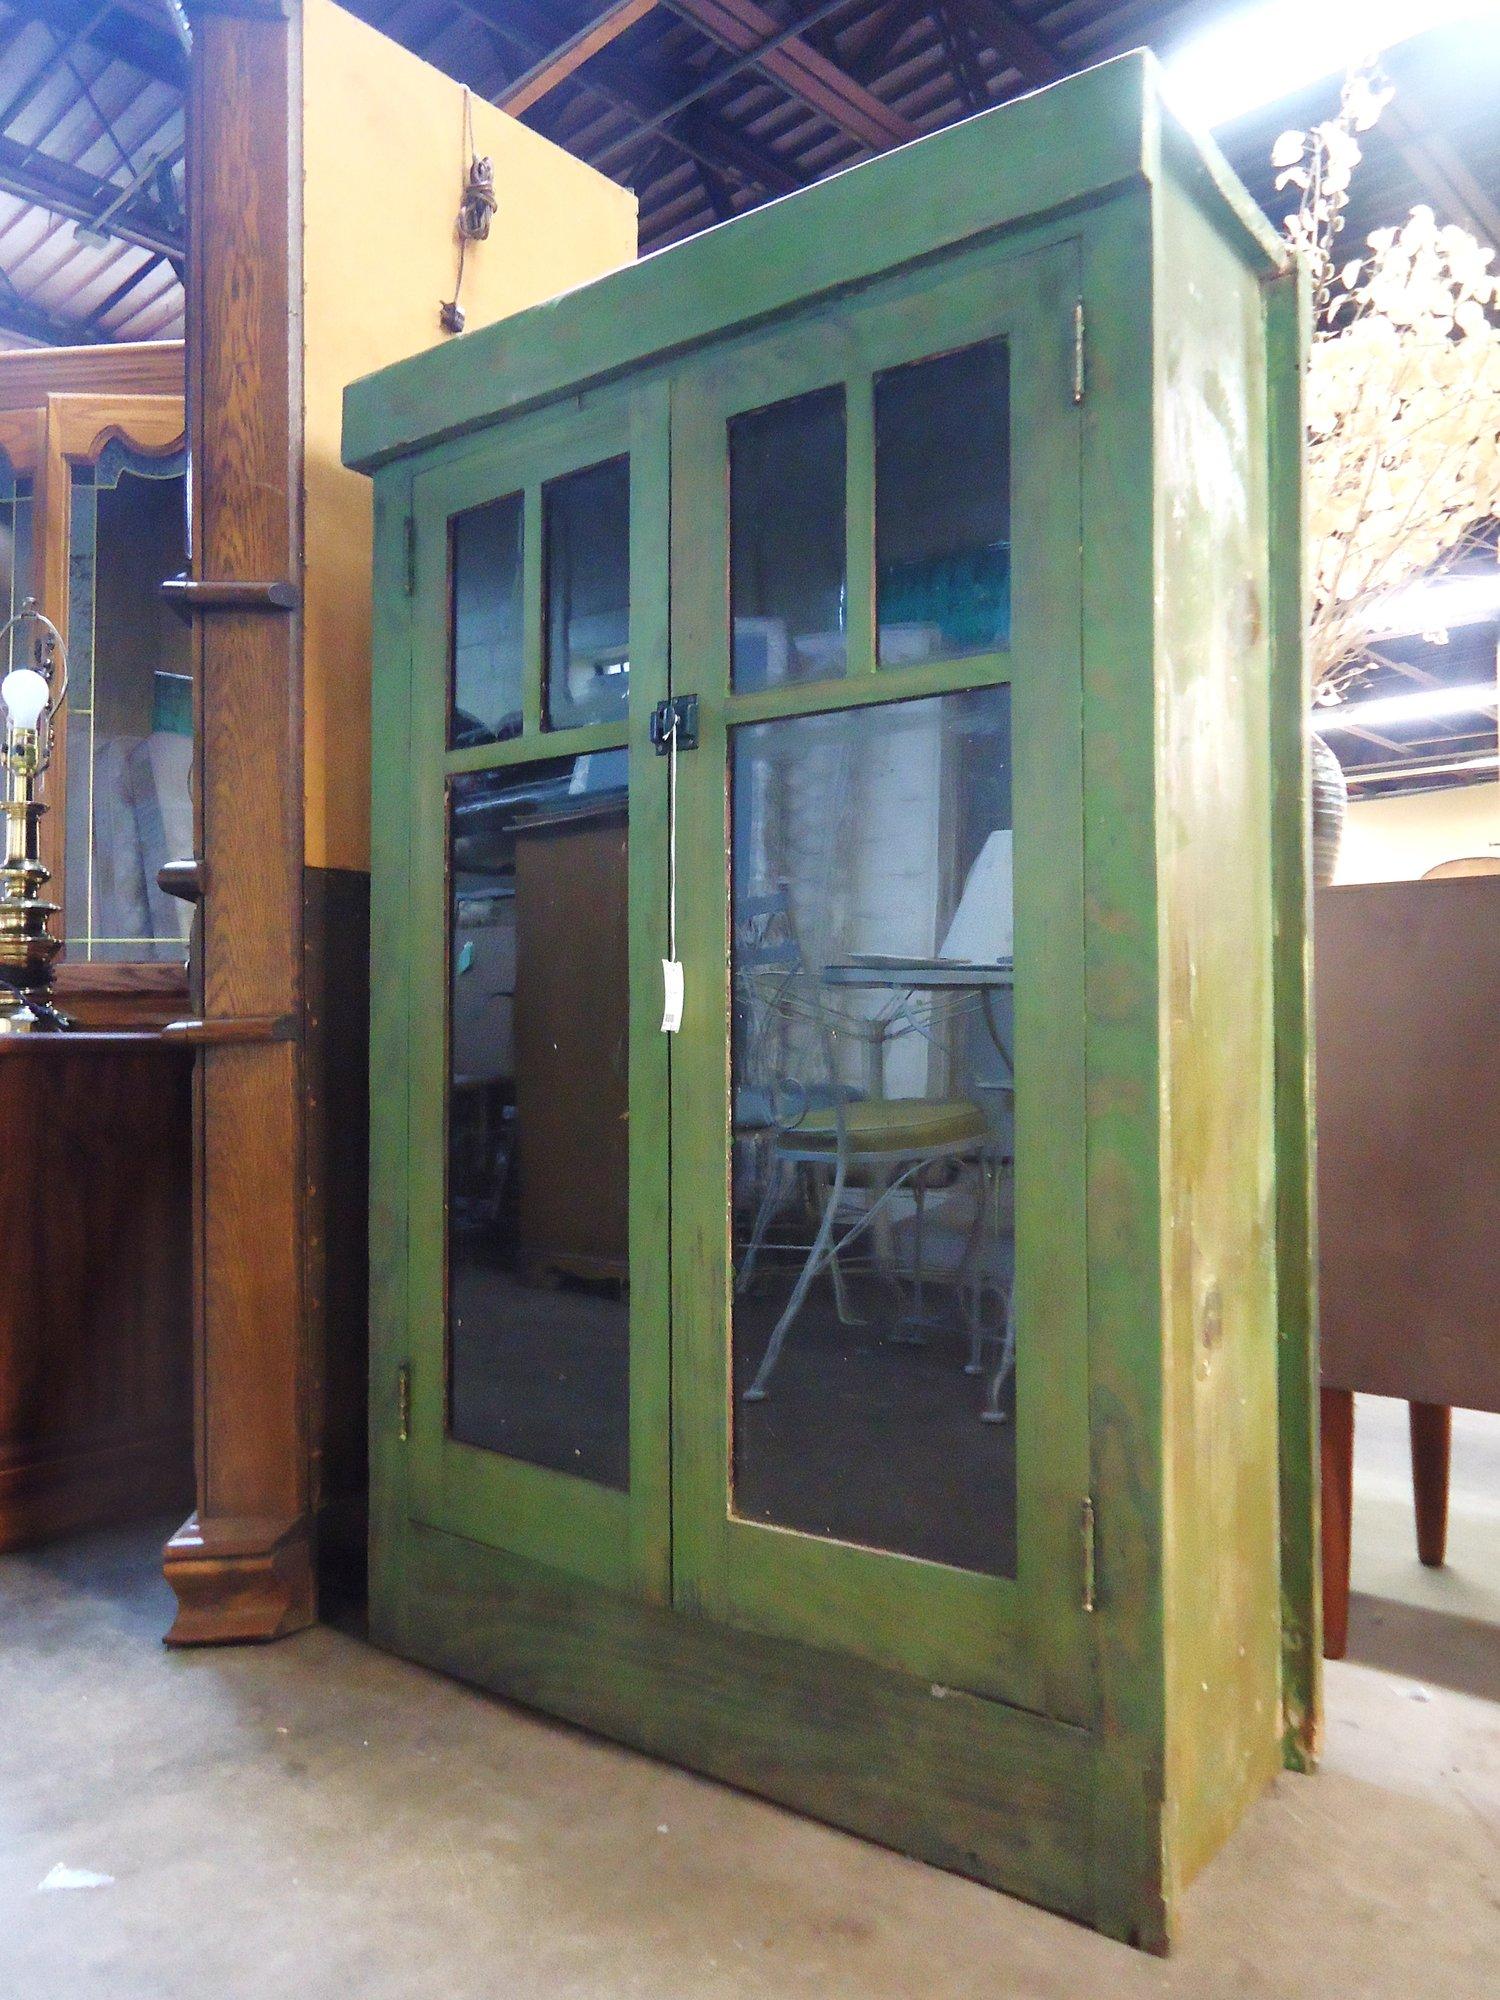 1 15232 Primitive Green Cabinet